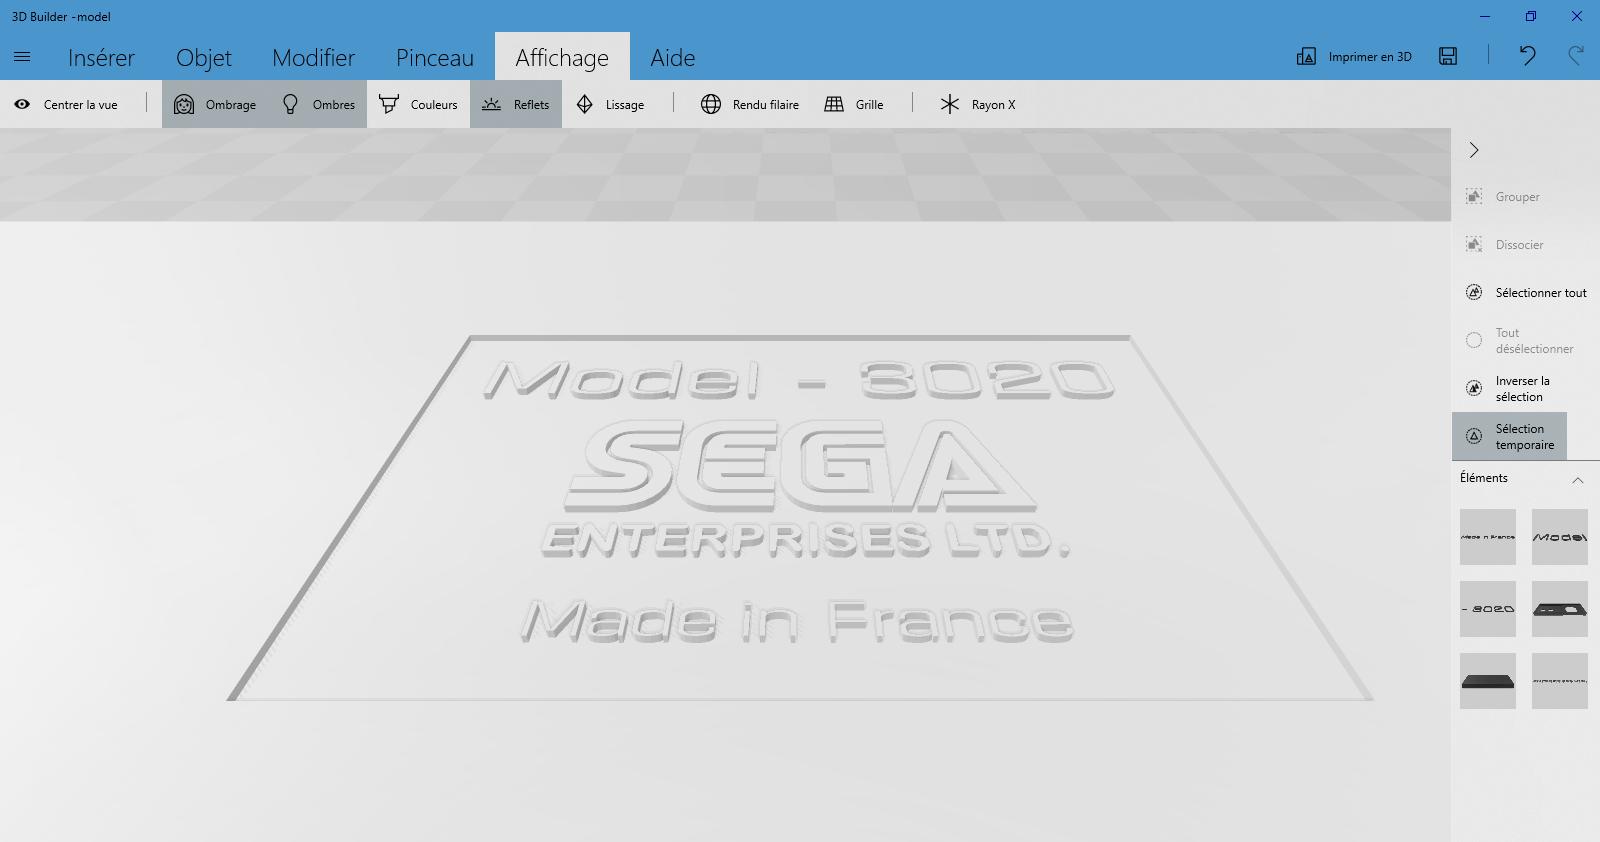 Sega annonce la Master System Mini!  - Page 2 Sans_t14